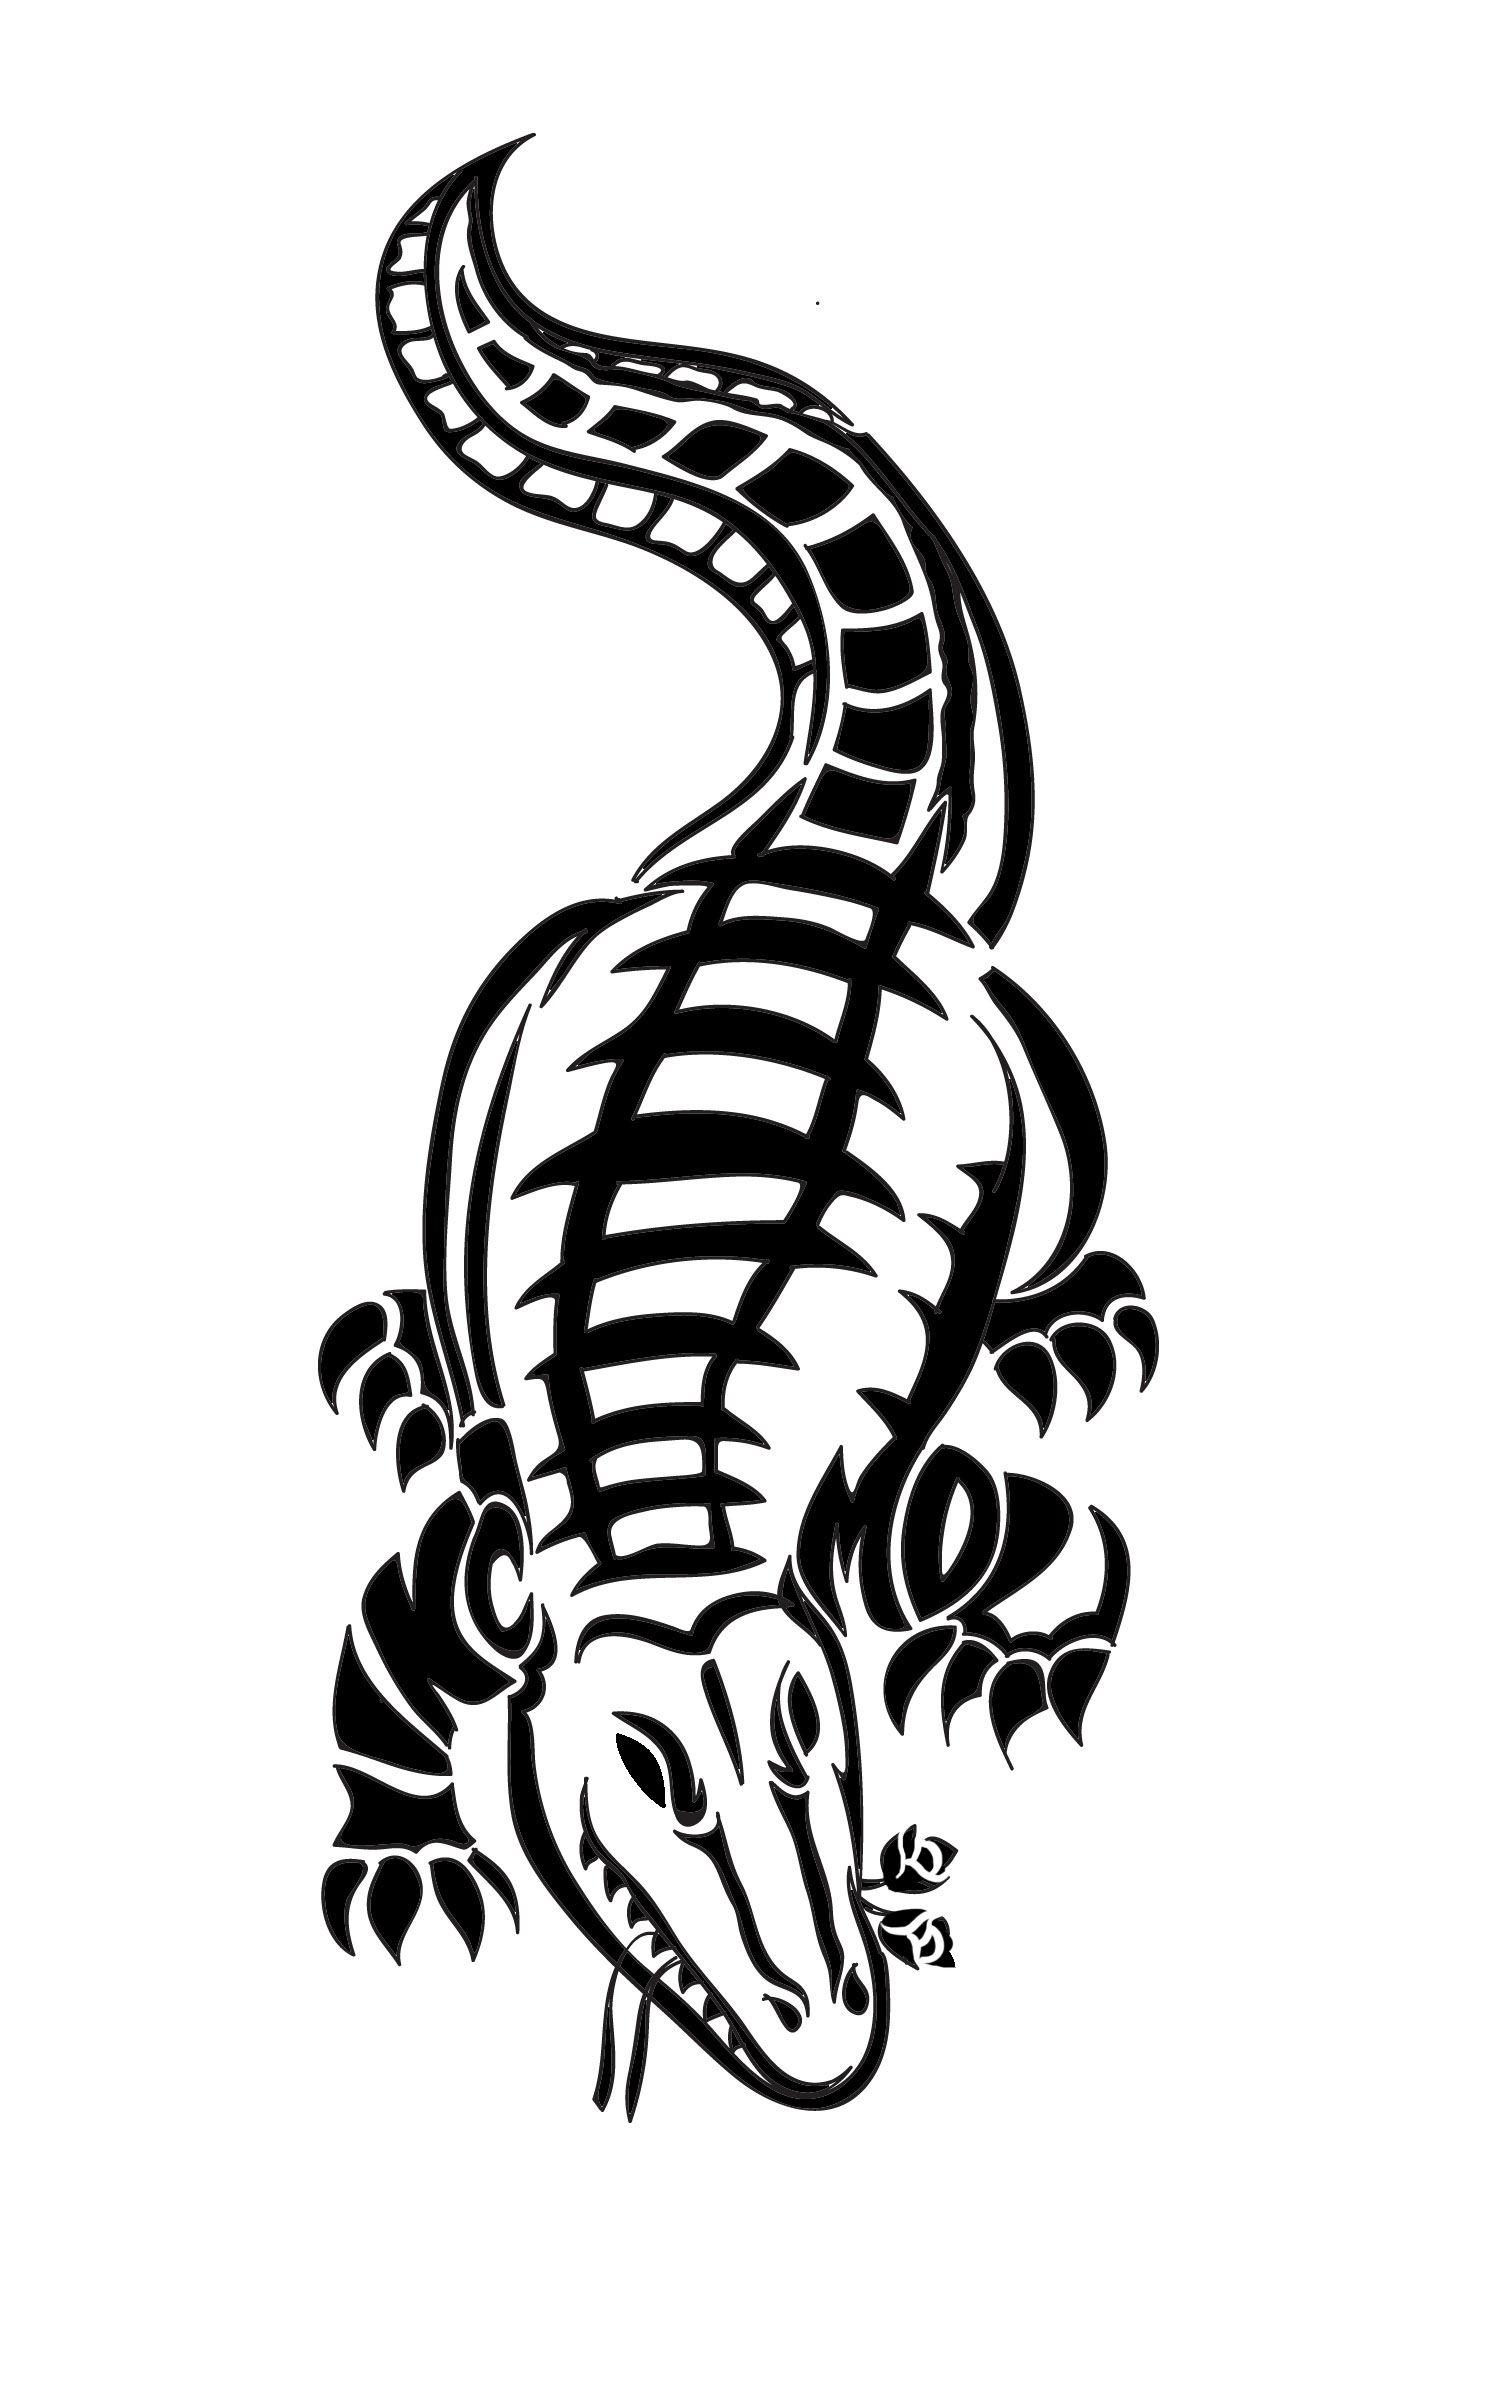 9d45aaa3a34a1 Alligator tribal tattoo with roses. Jm- Mazio eden | ArtistJazz ...